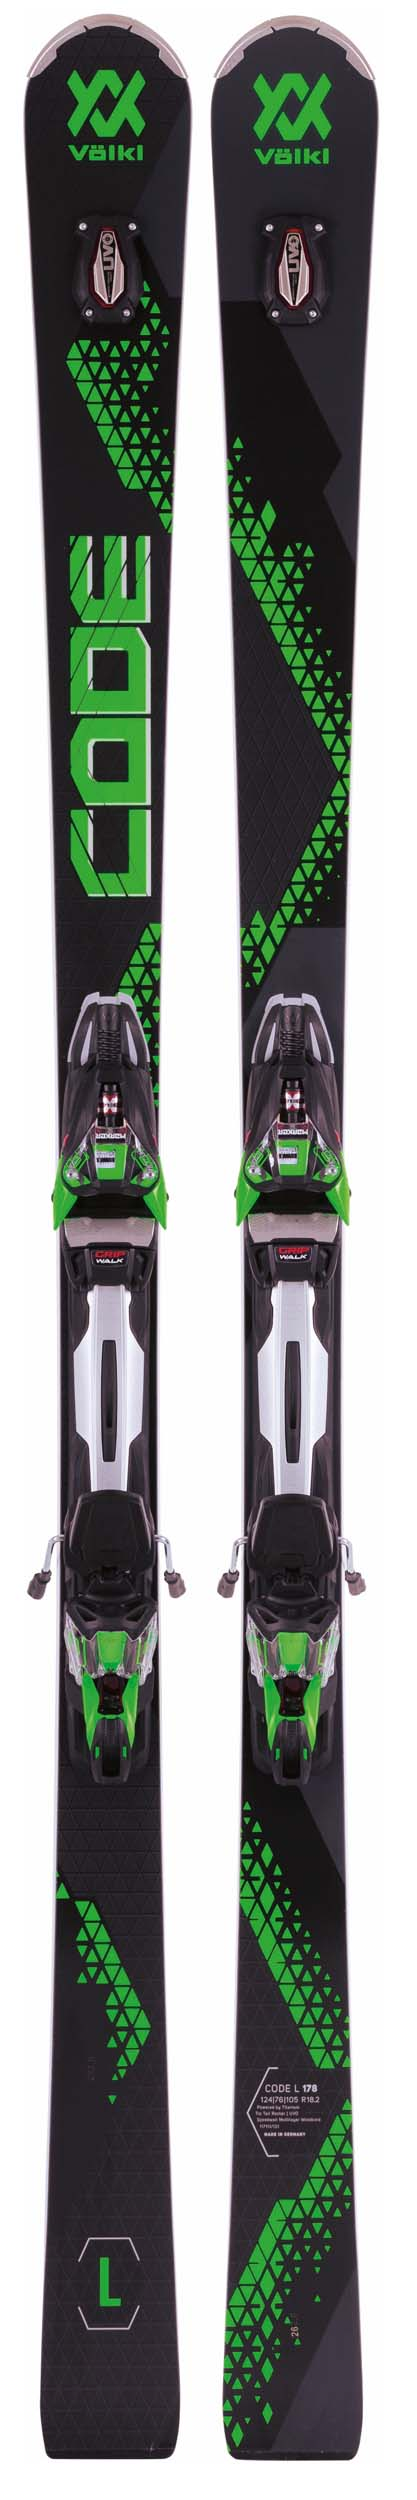 Volkl 2018 Code L Skis w/rMotion2 12.0 Bindings NEW !! 178cm